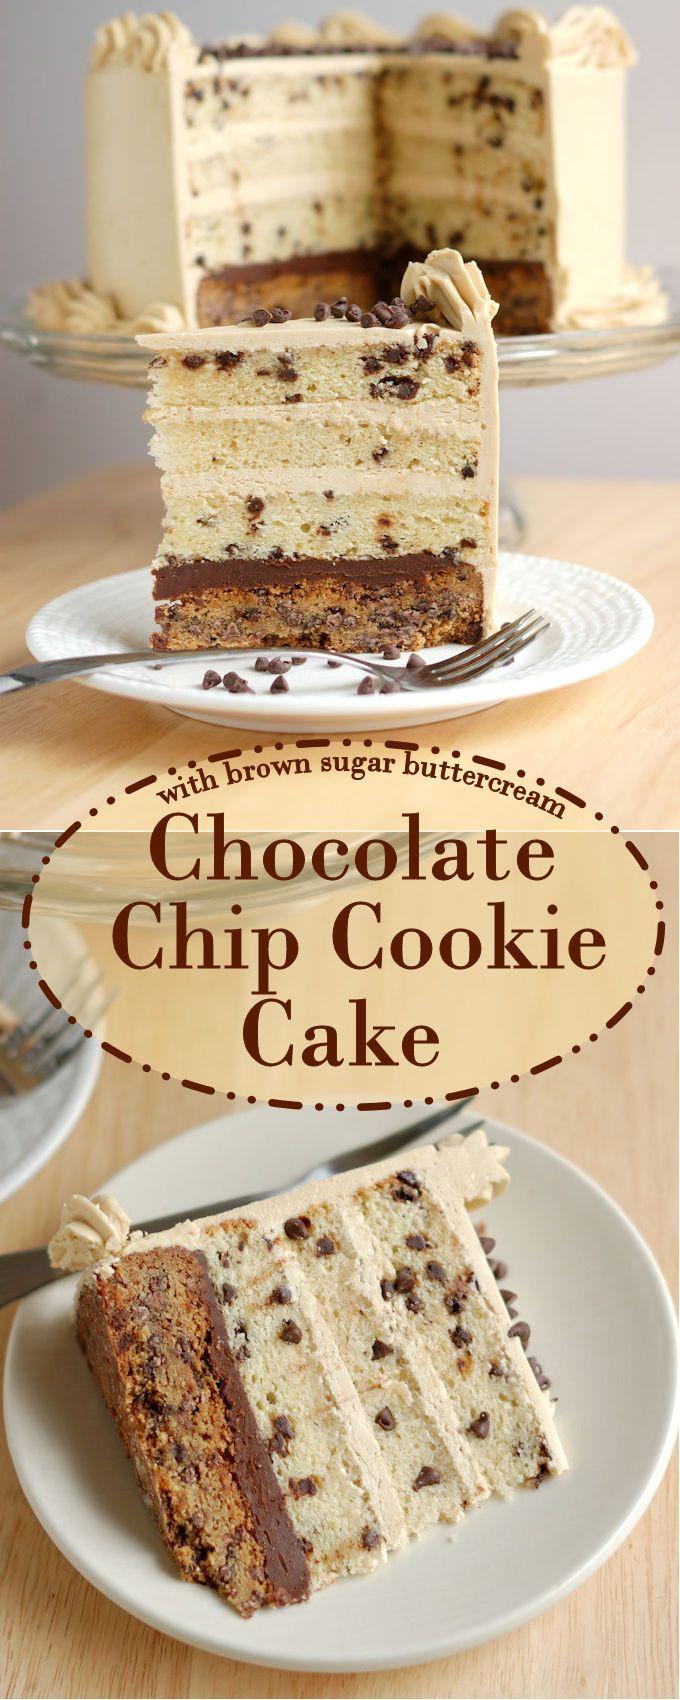 Birthday Cake Flavor Ideas  Best 20 Cake flavors ideas on Pinterest